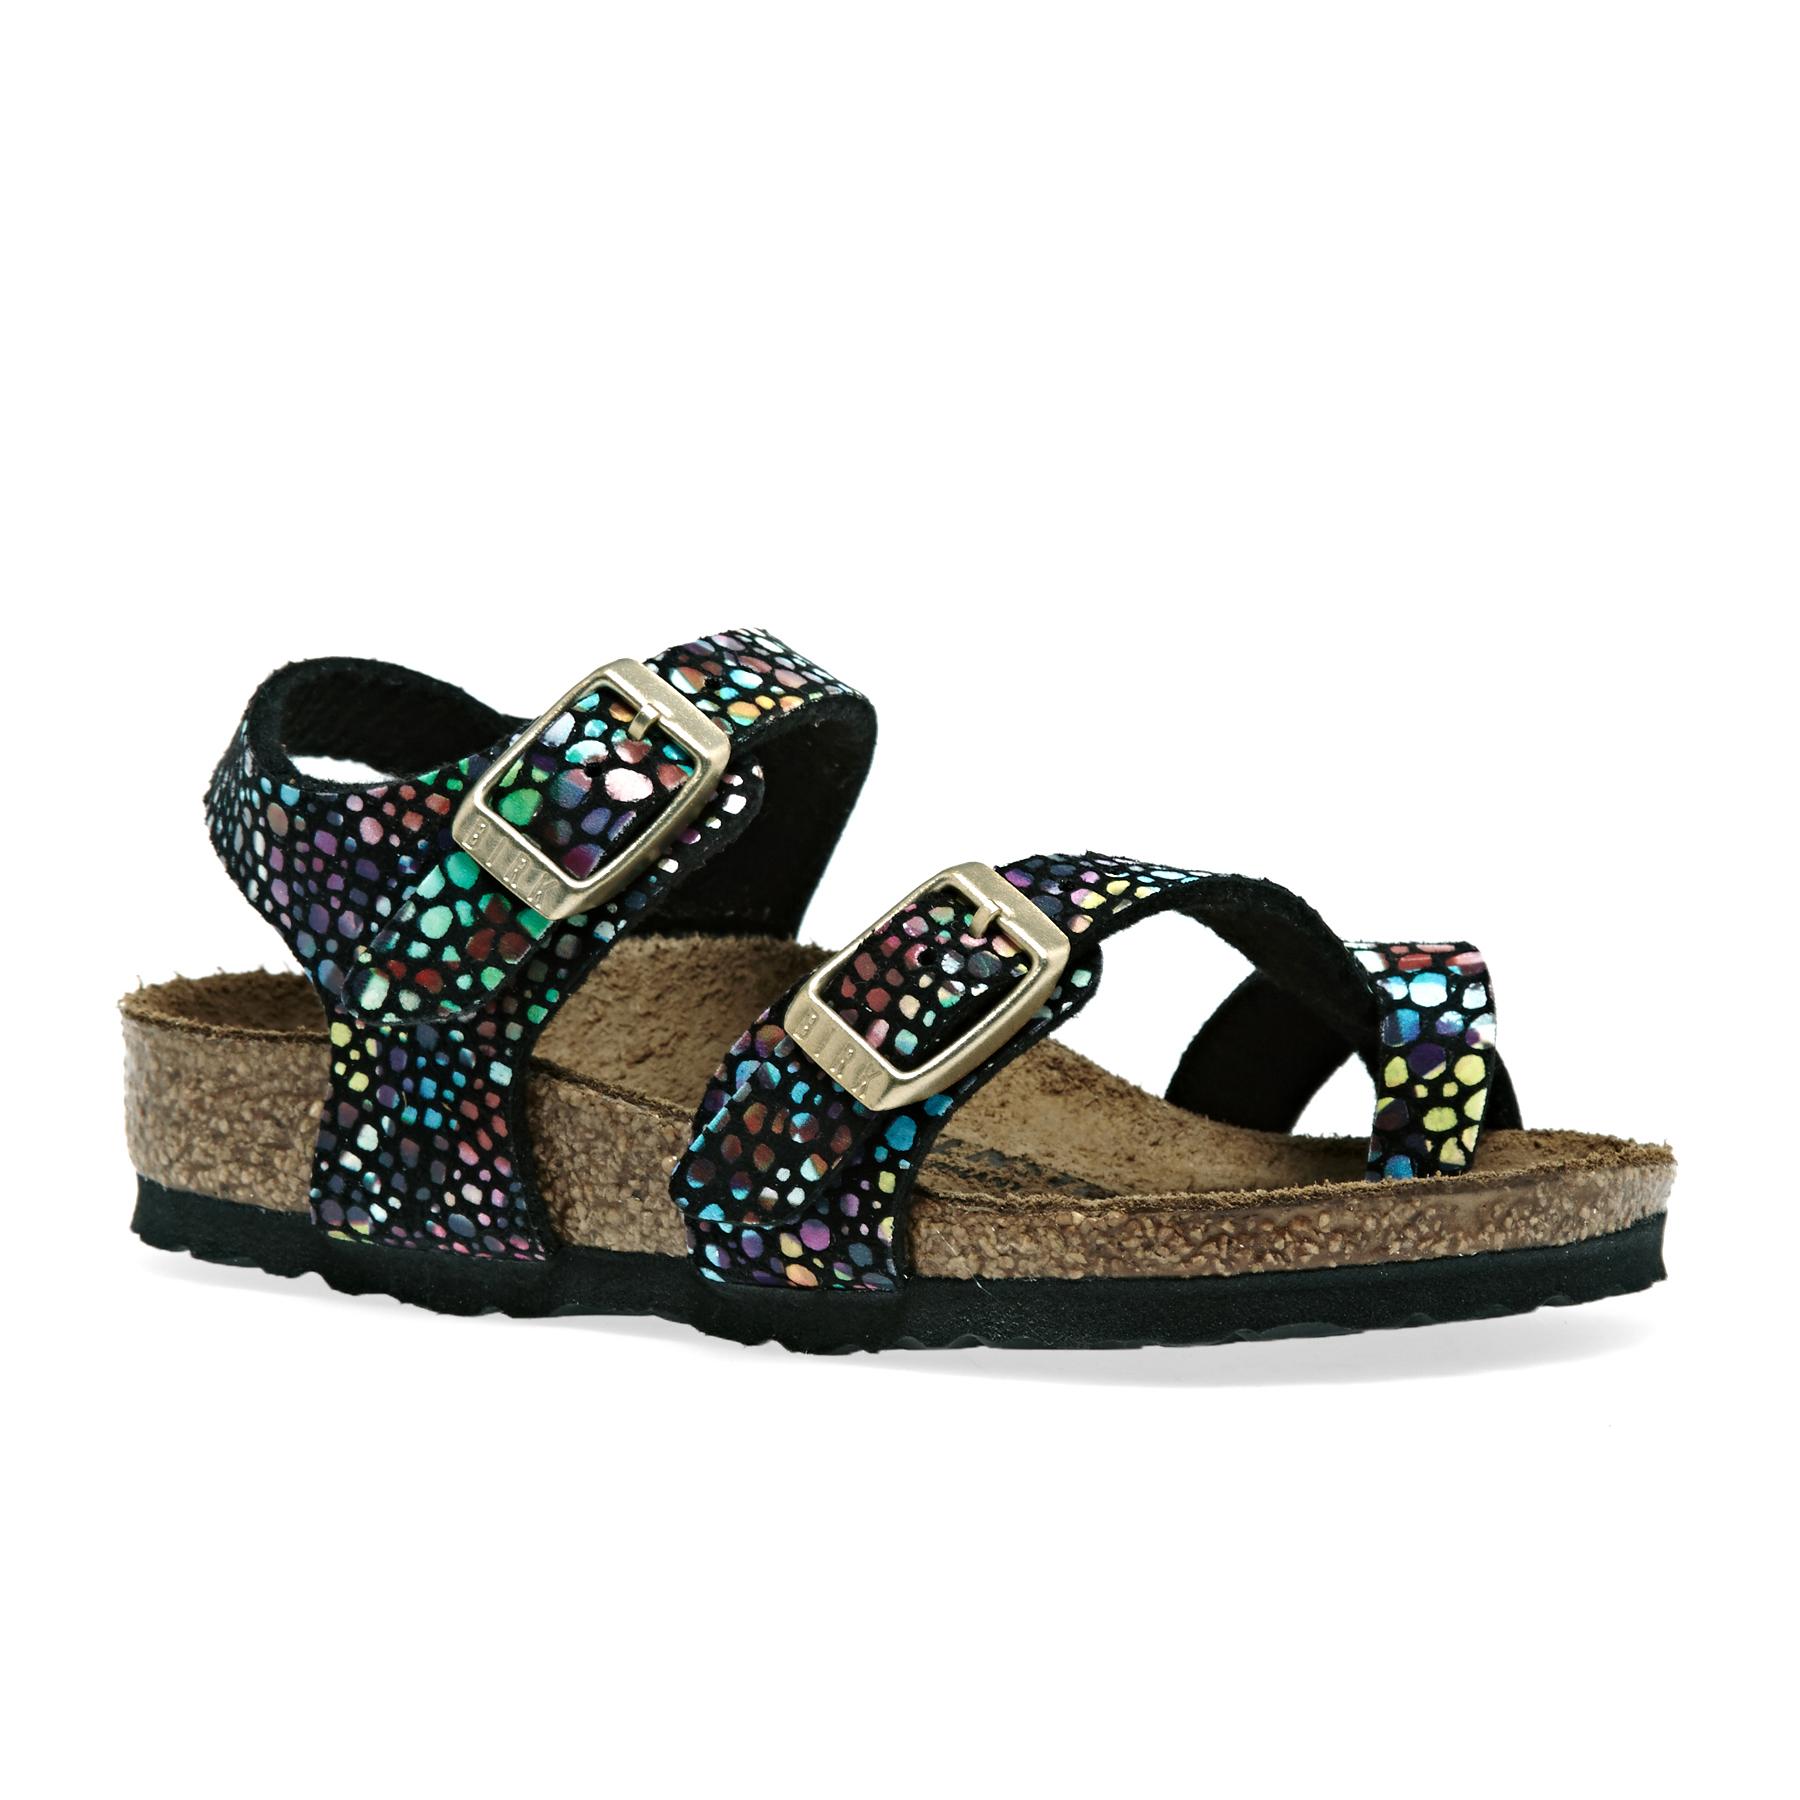 Birkenstock Taormina Kids Sandals Free Delivery options on